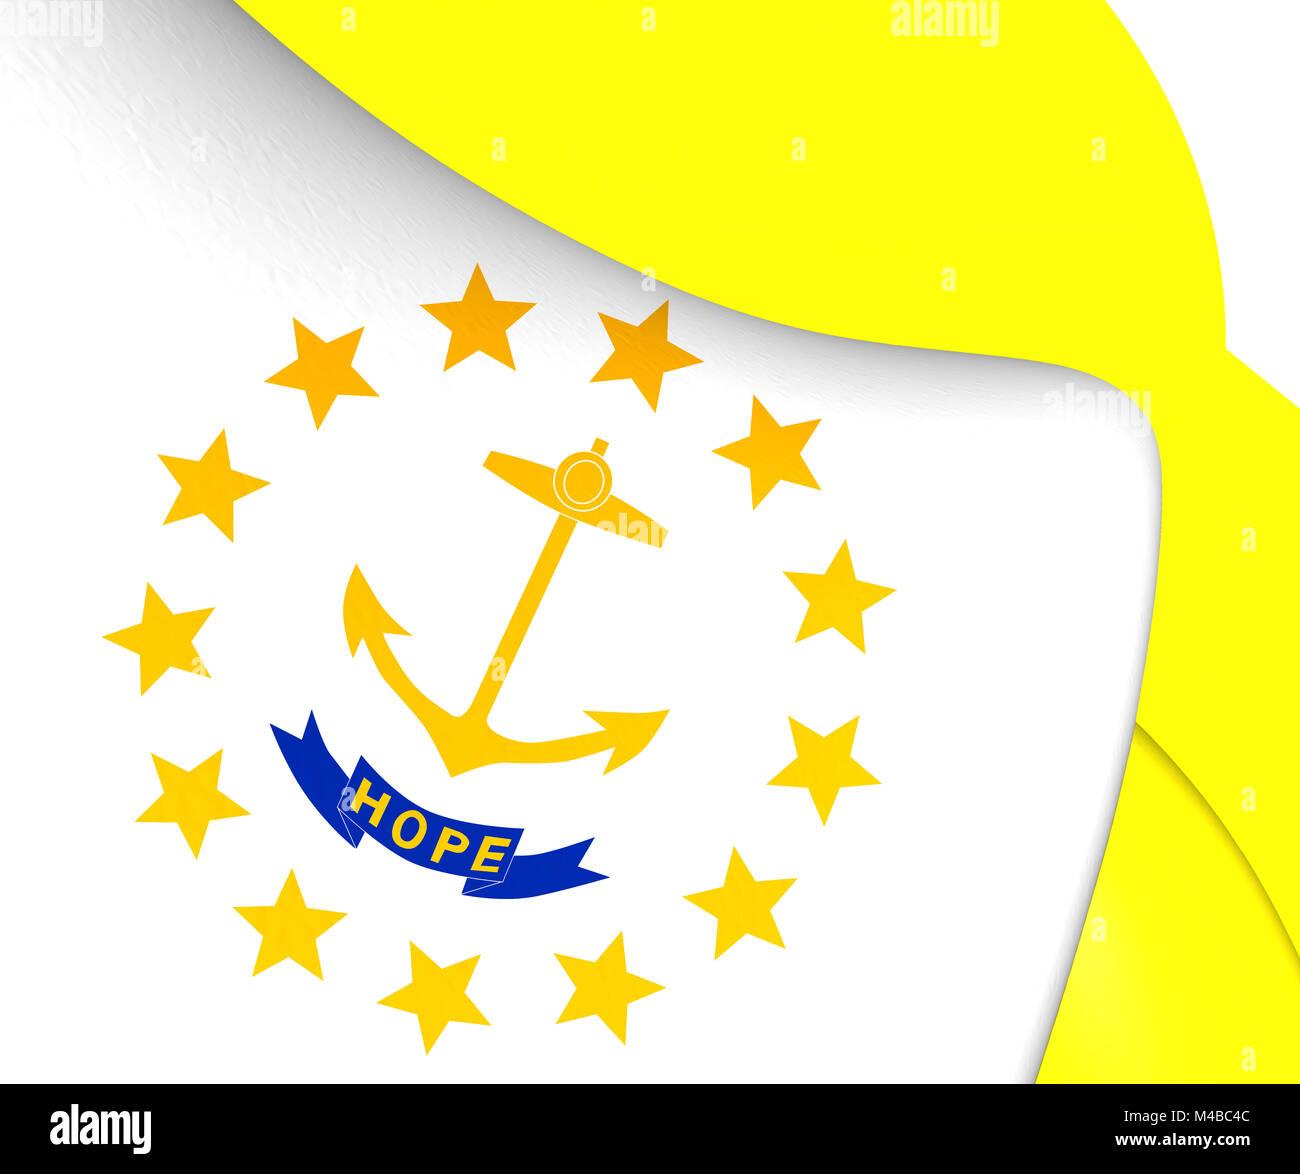 Rhode island state flag stock photos rhode island state flag flag of rhode island stock image biocorpaavc Choice Image